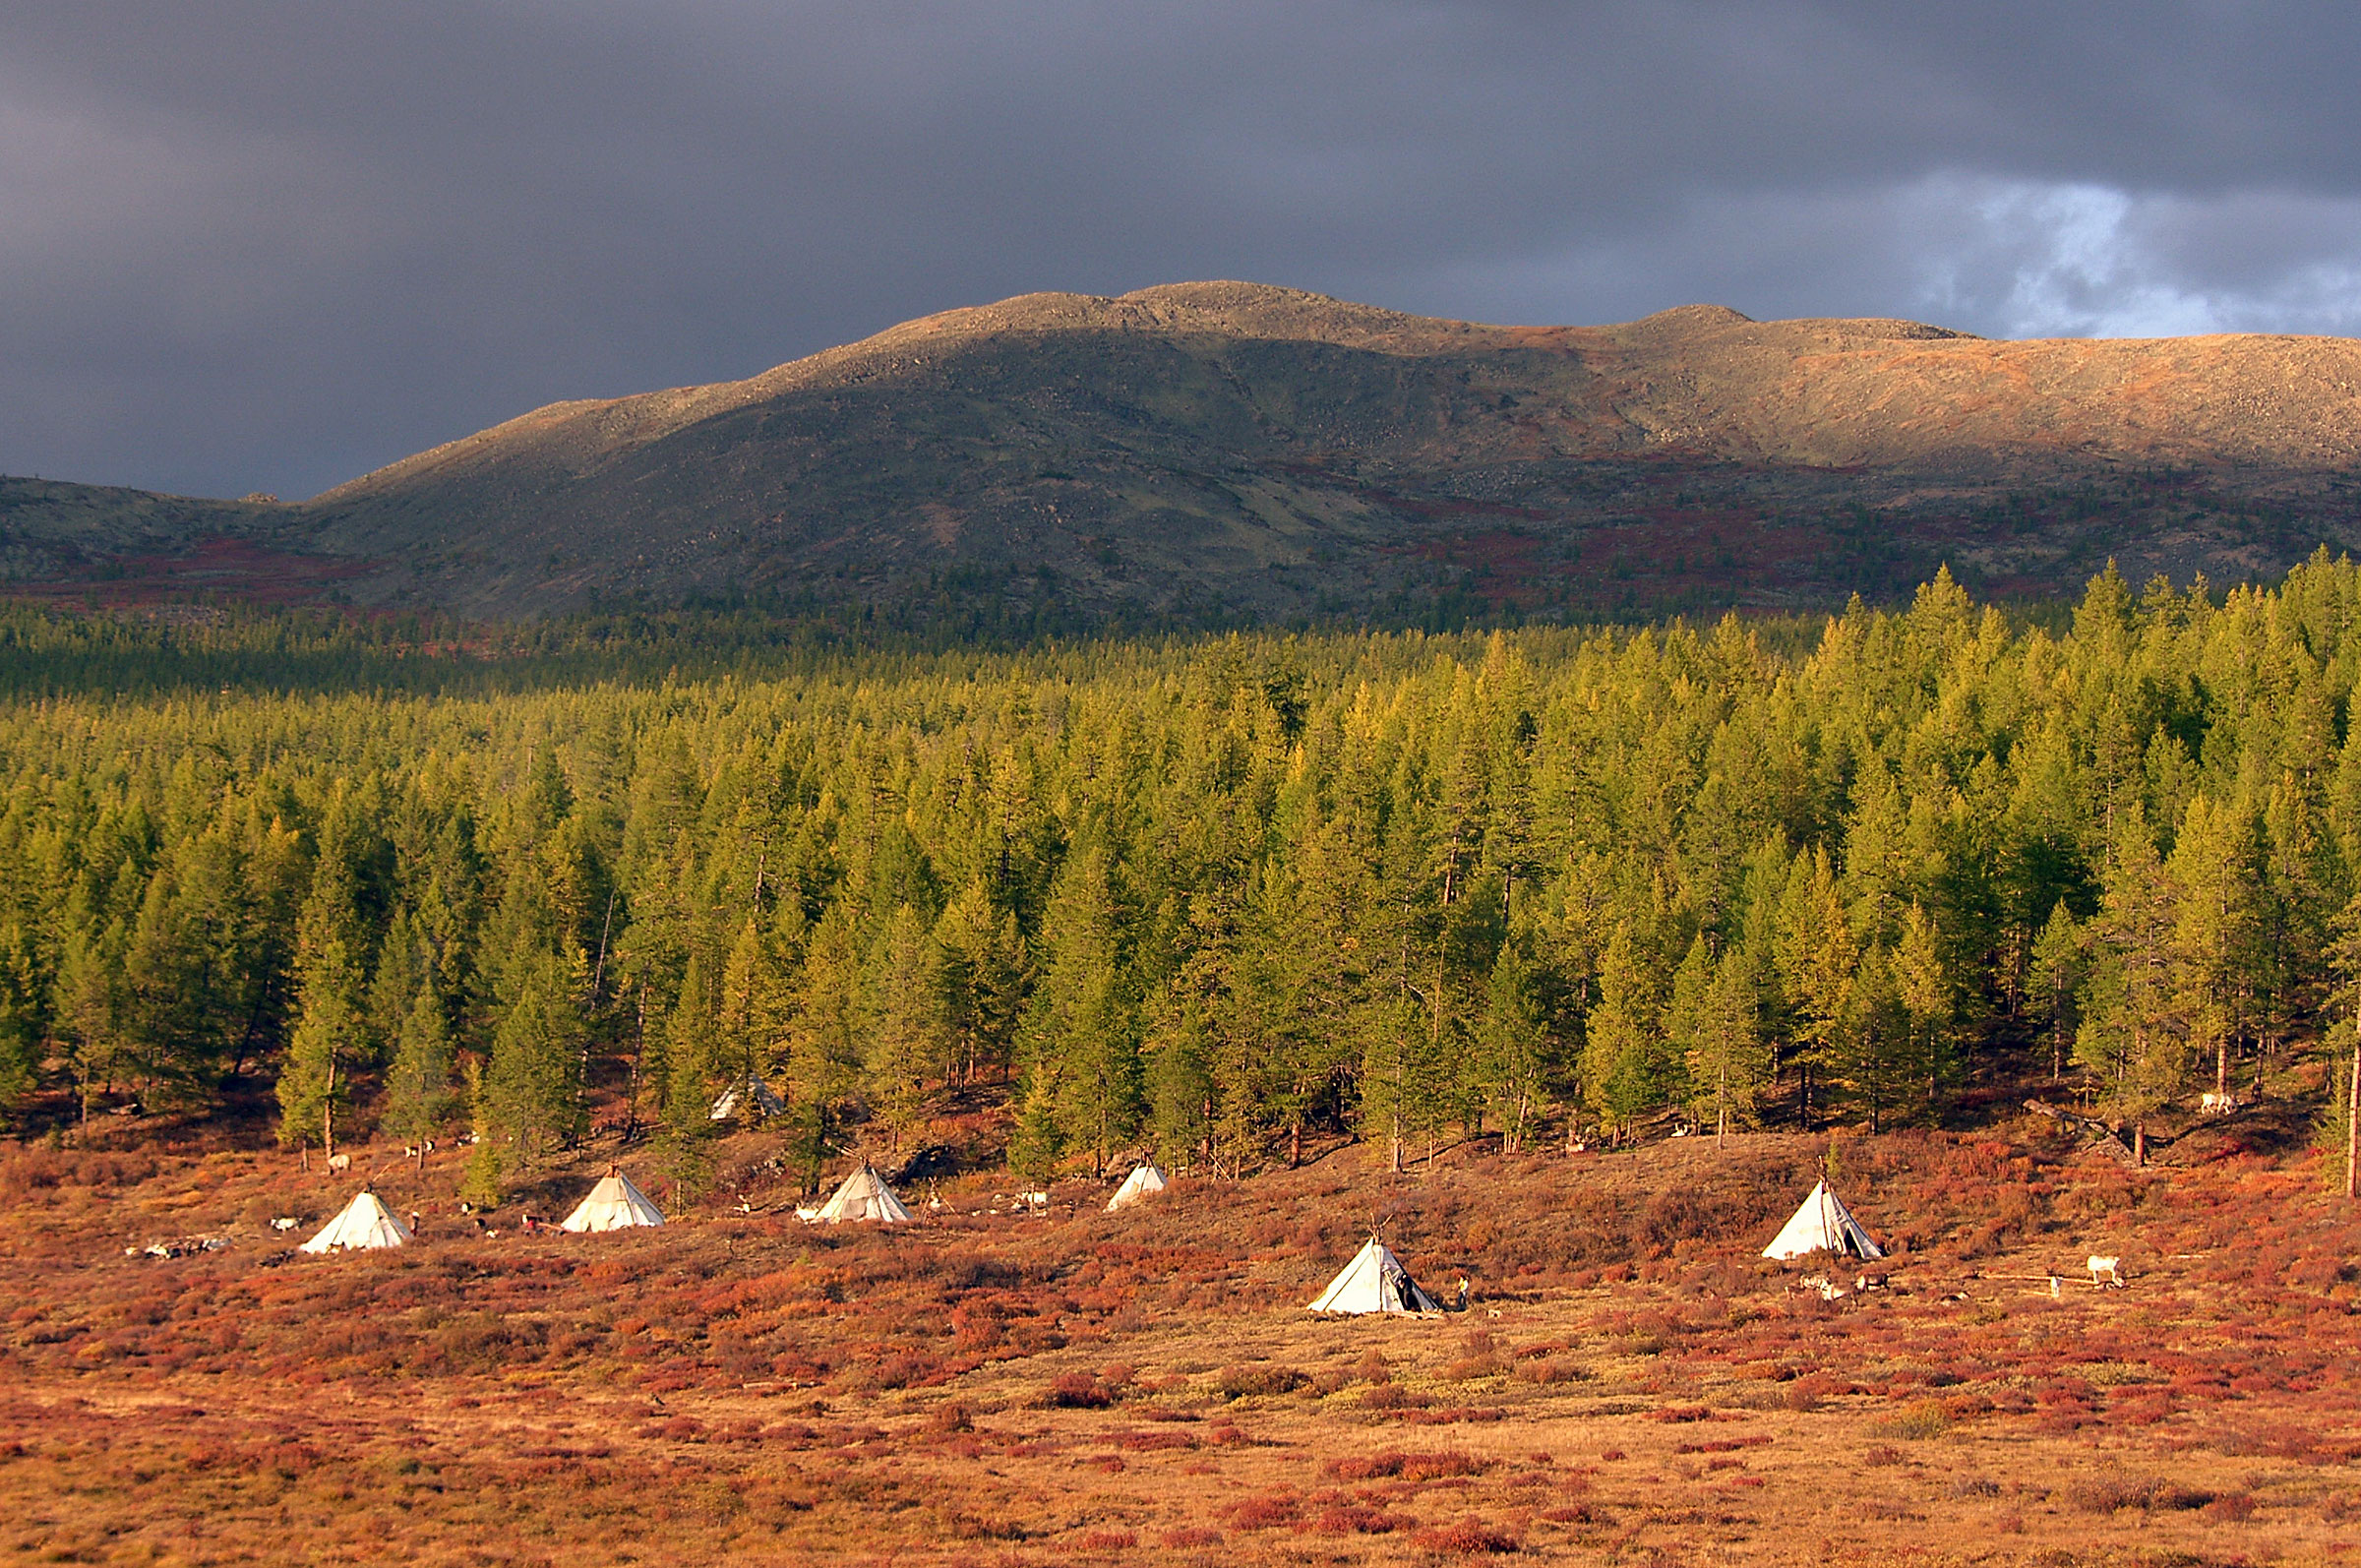 Mongolia's East Taiga reindeer herder camp. Photo Dan Bailey.